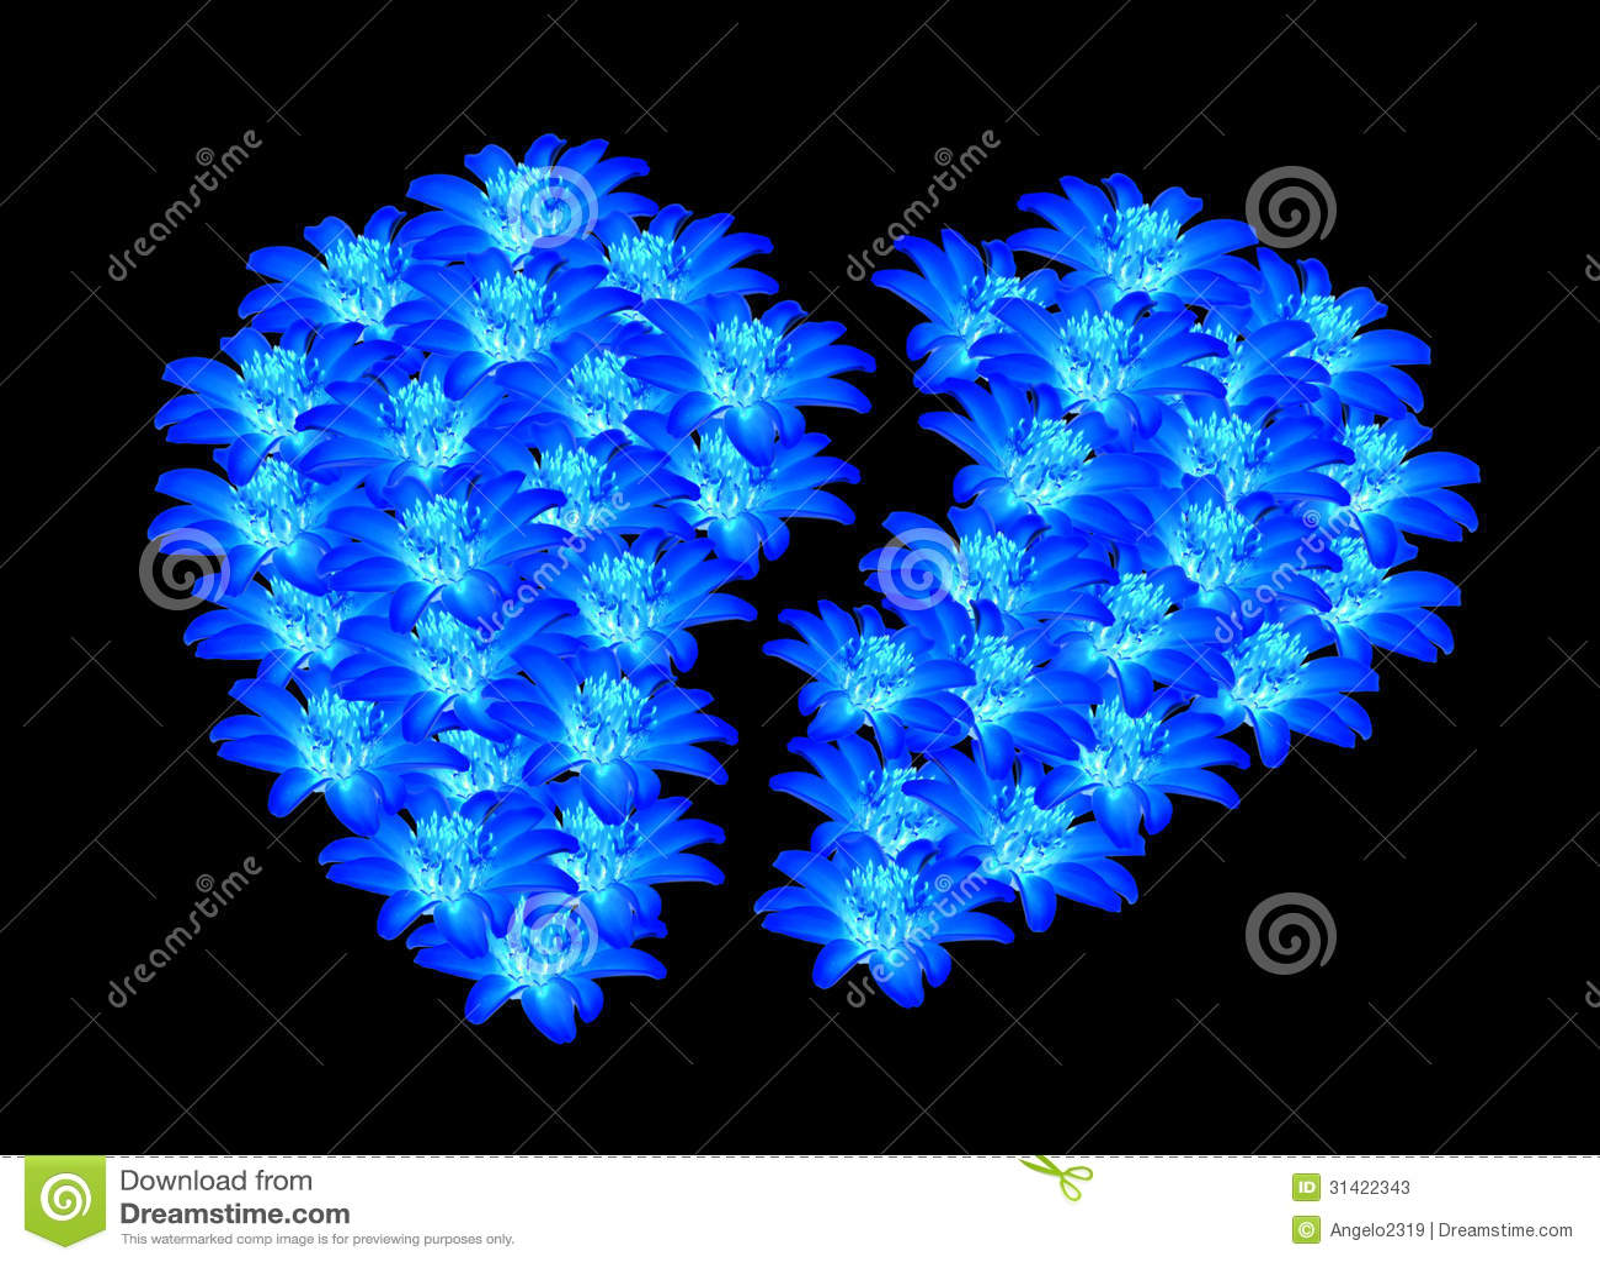 Beautiful Blue Flowers Heart Shaped Apart Stock Image Image Of